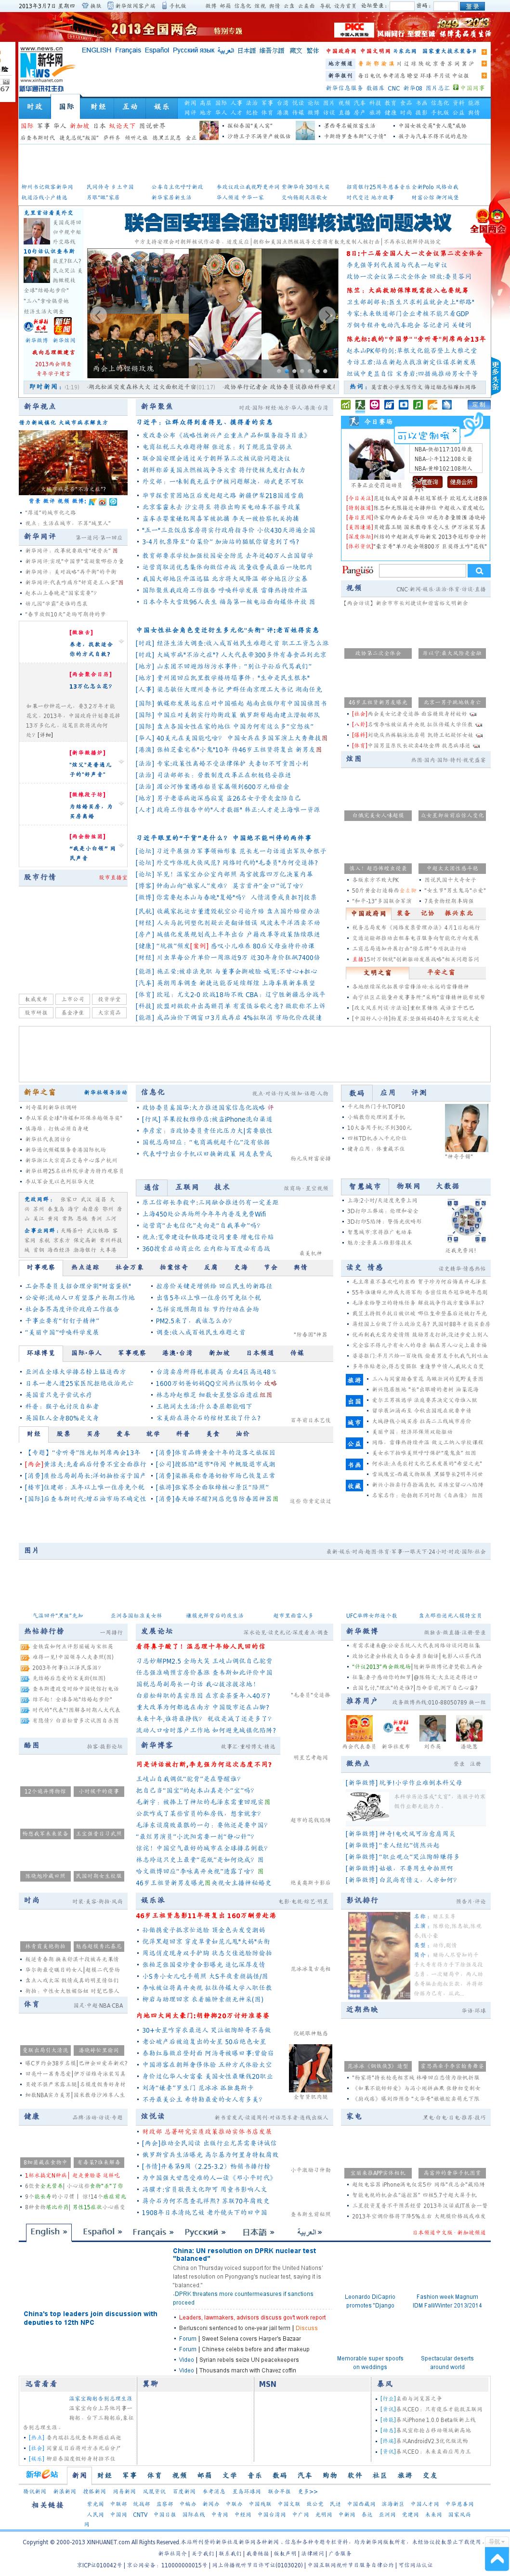 Xinhua at Thursday March 7, 2013, 5:23 p.m. UTC